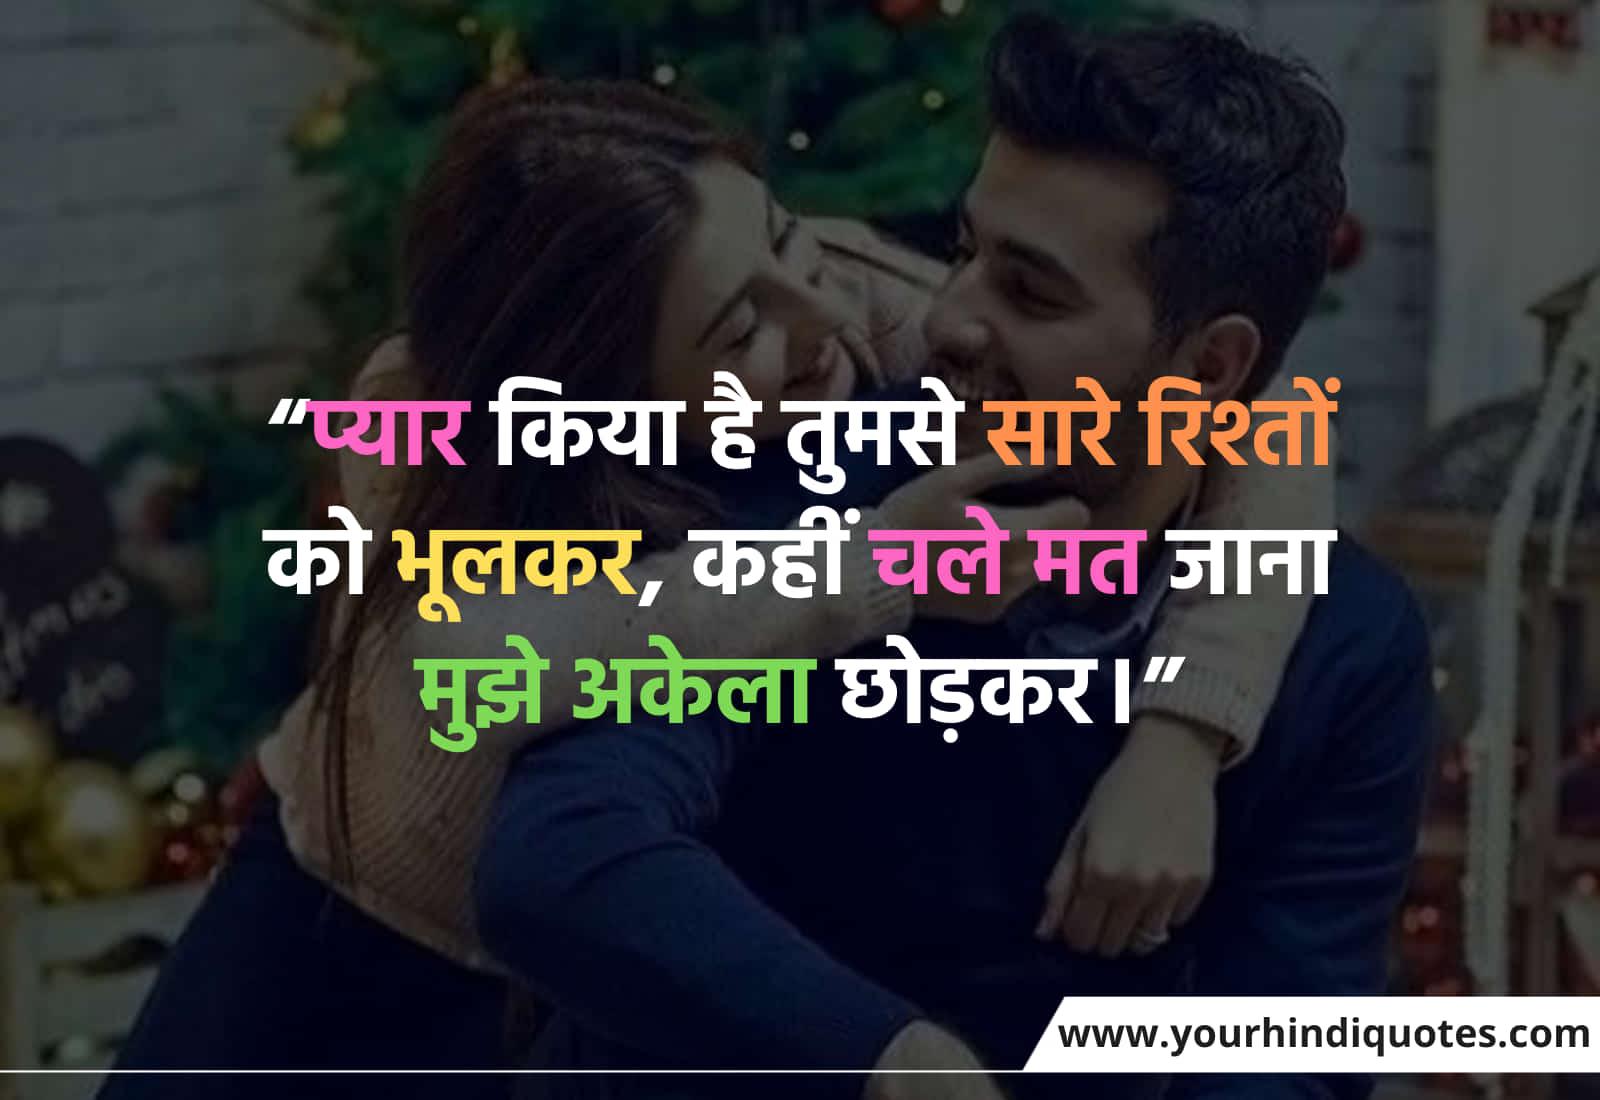 Hindi Love Status For Him